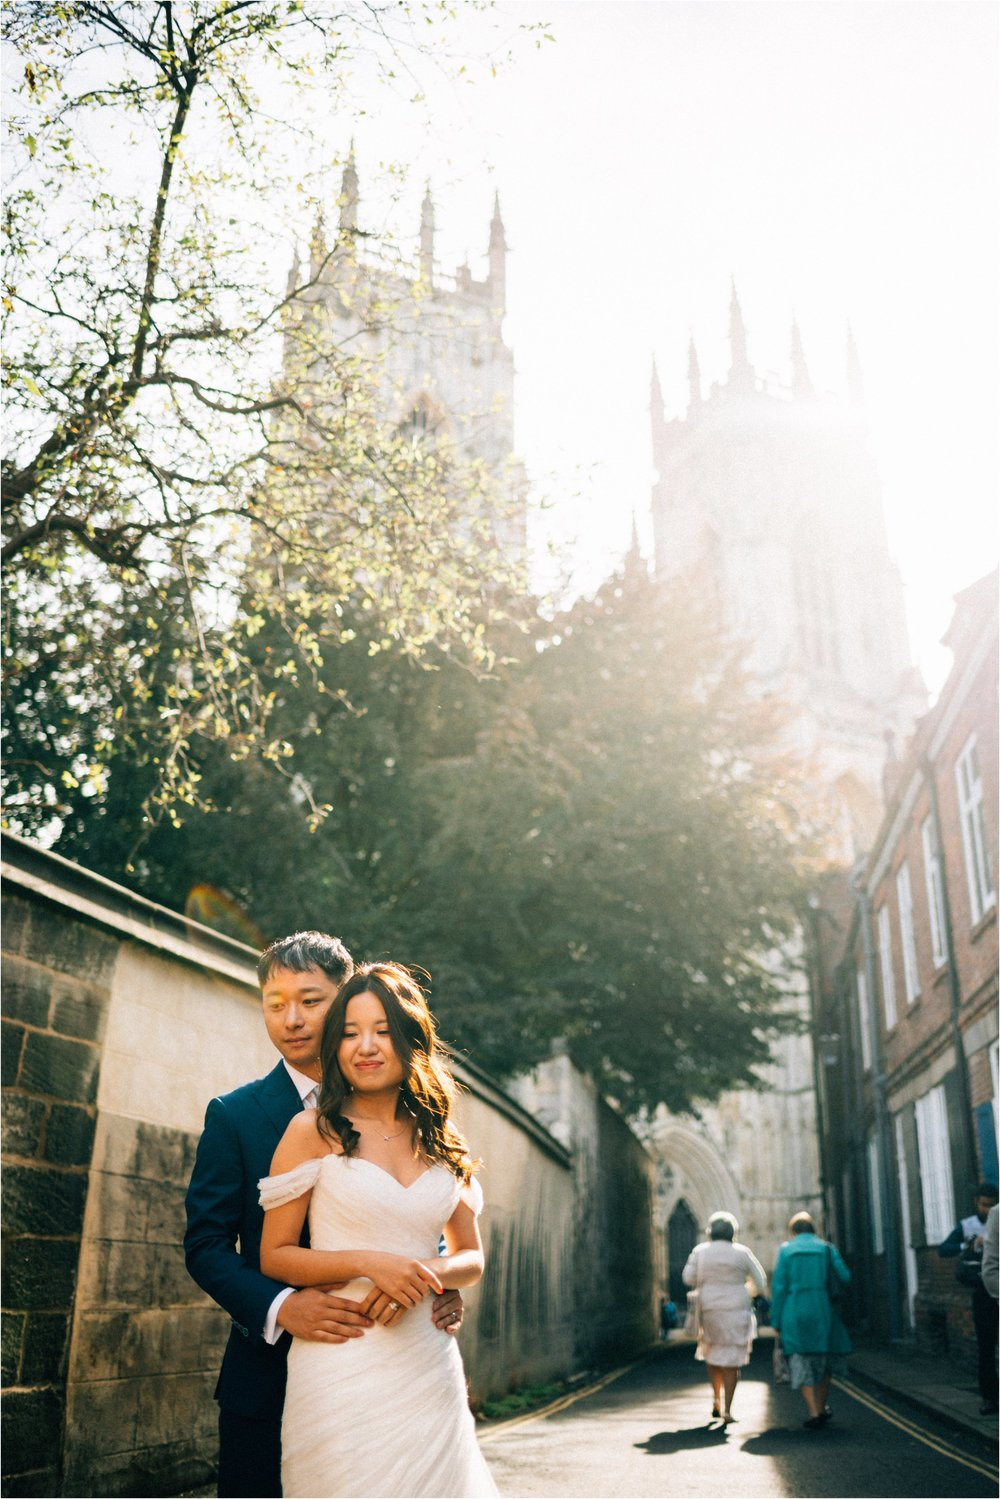 York city elopement wedding photographer_0080.jpg